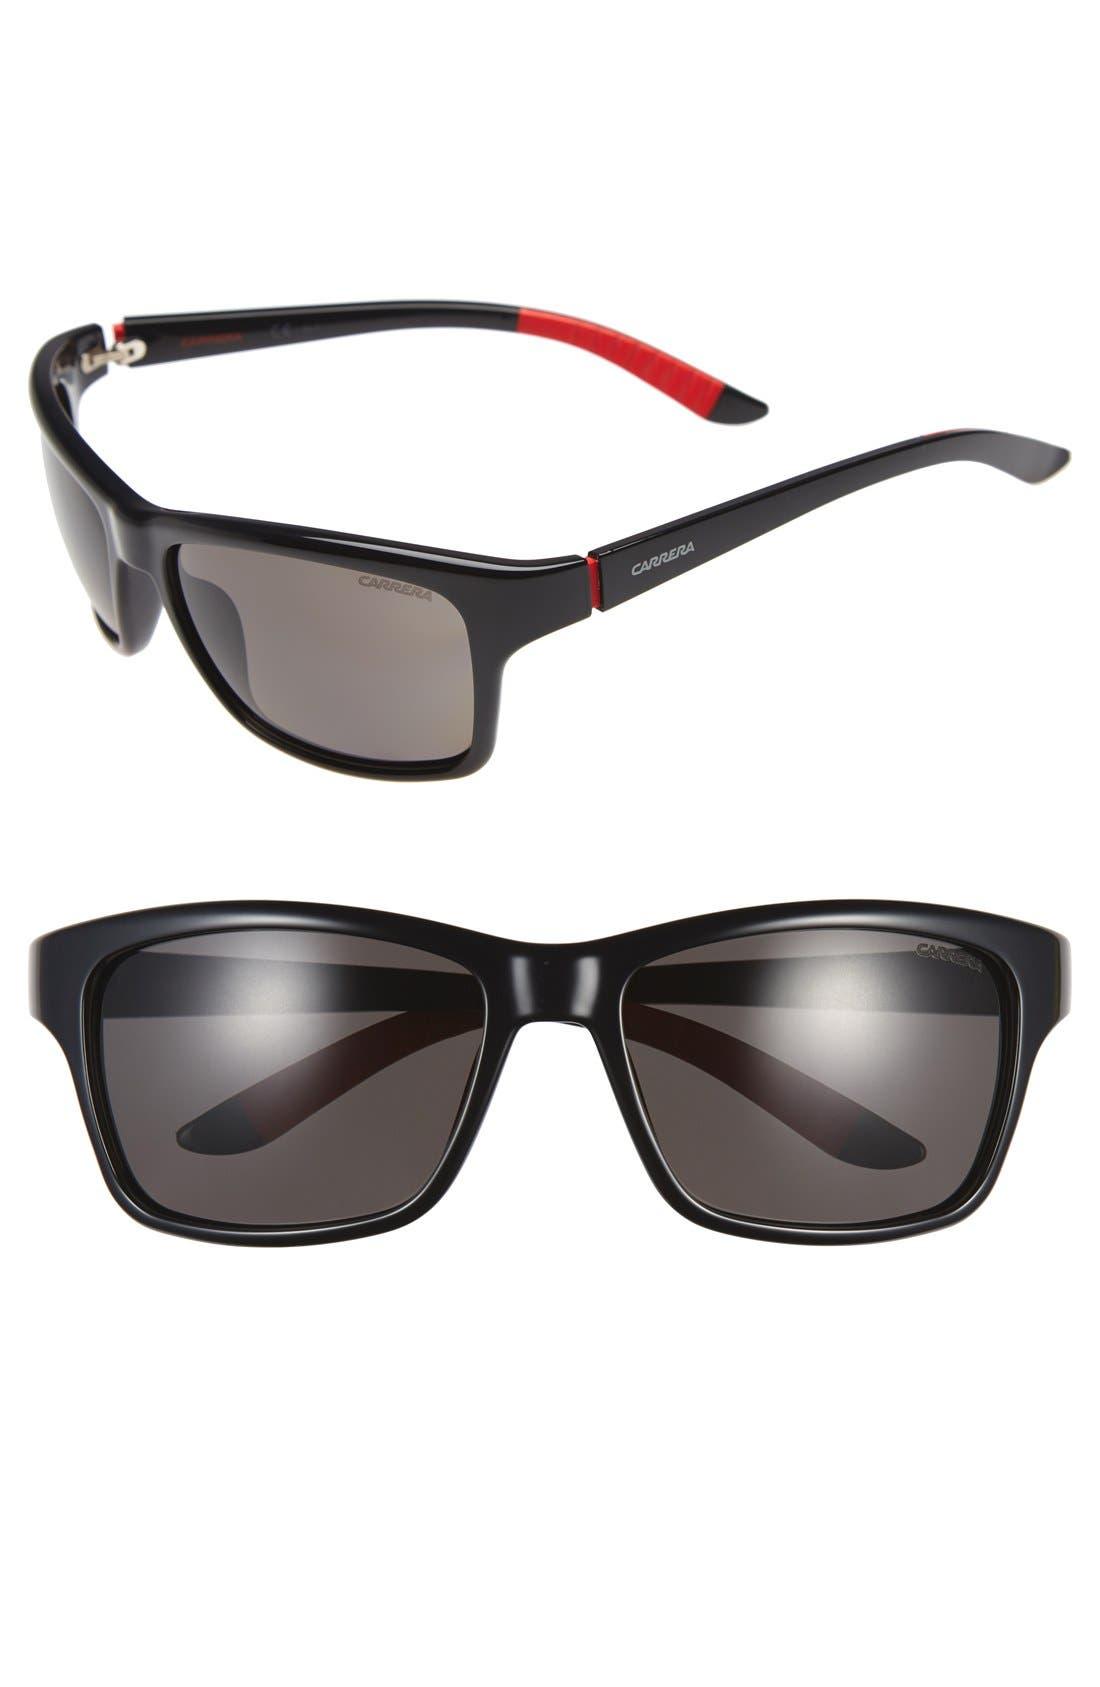 Main Image - Carrera Eyewear 58mm Polarized Sunglasses